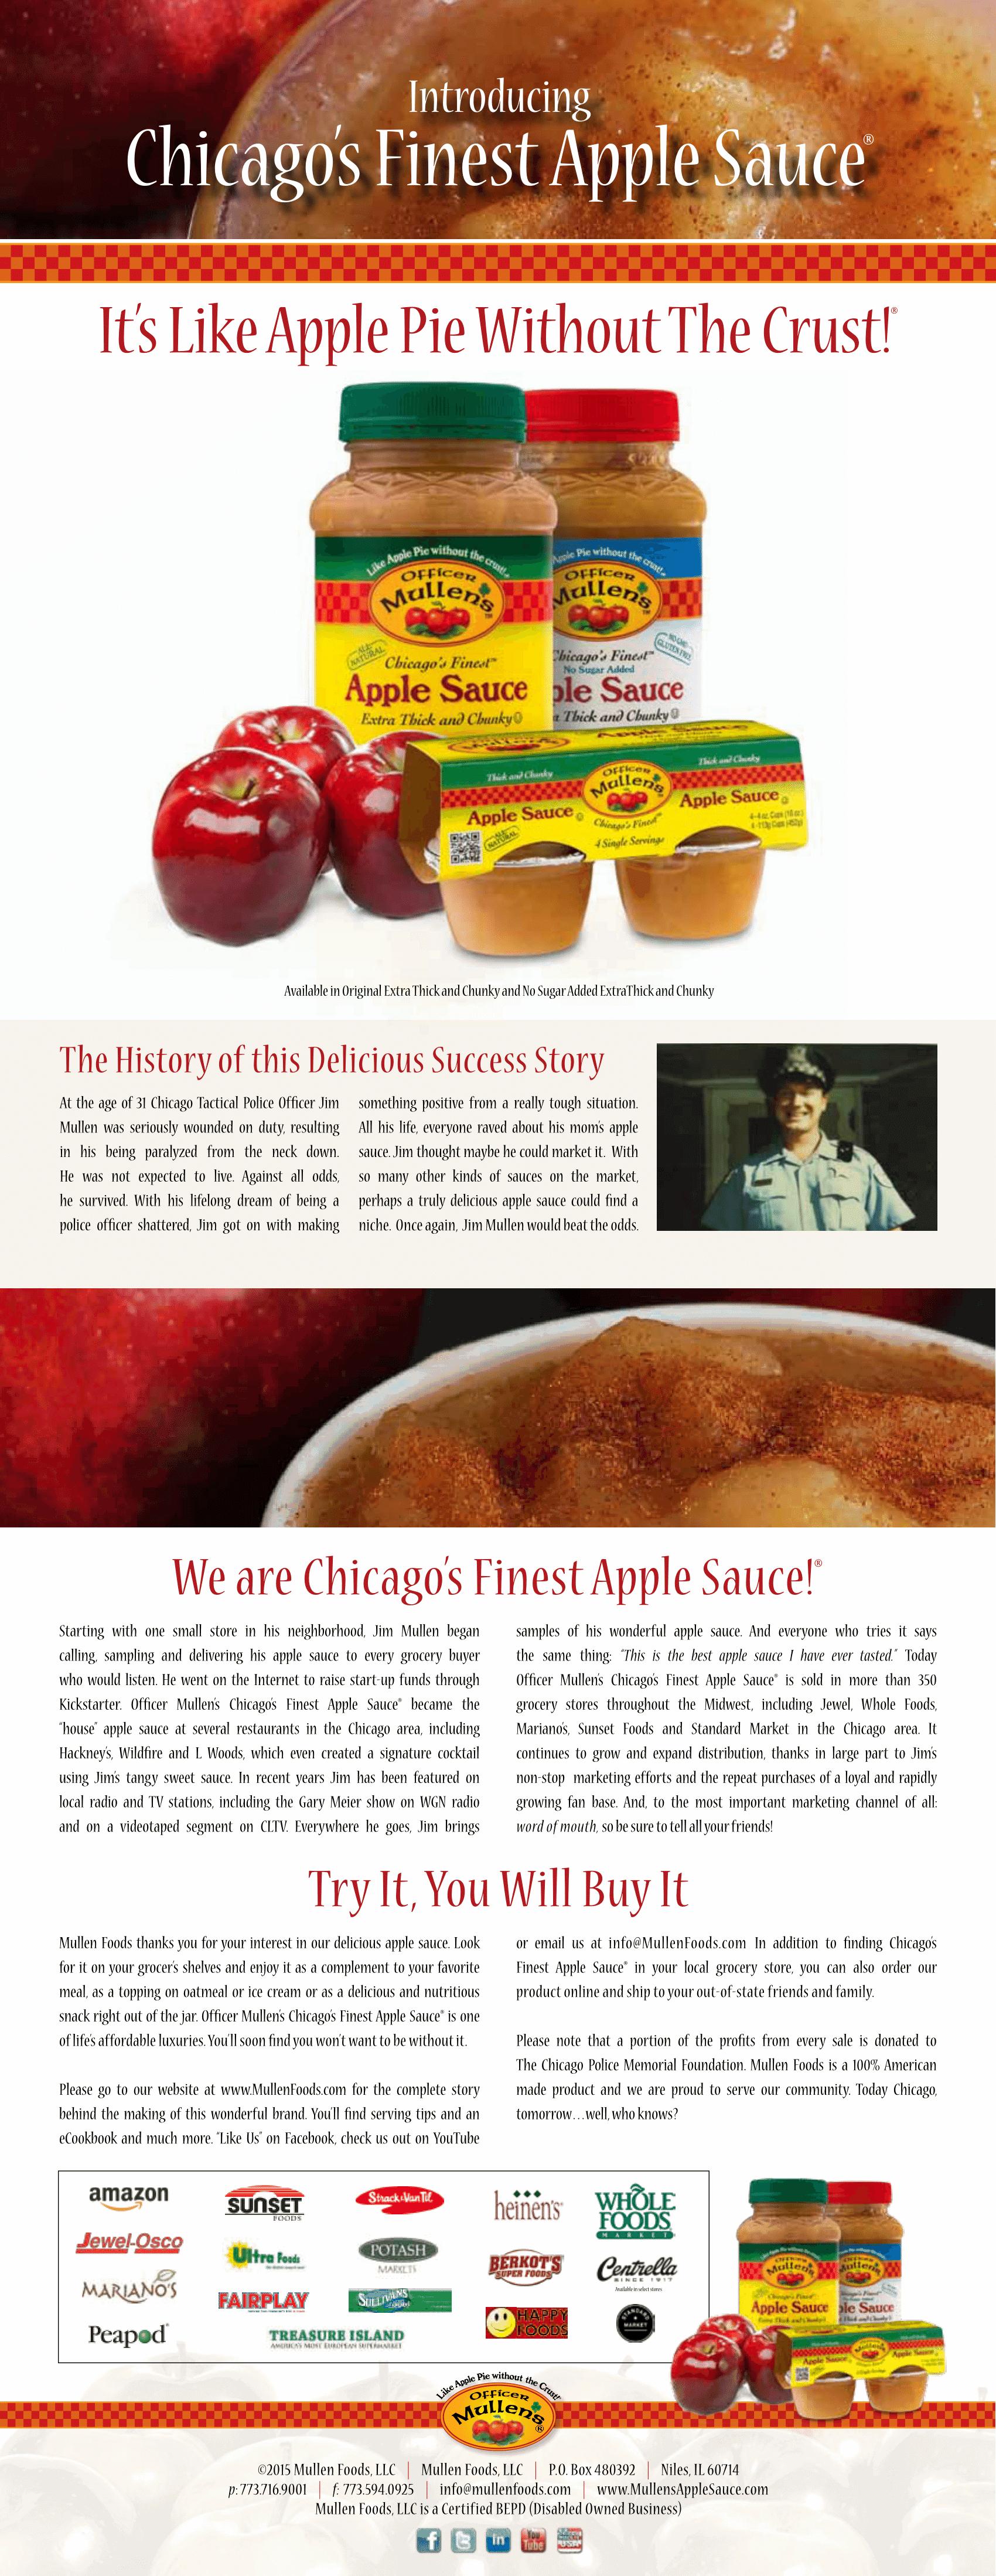 Mullen's Applesauce Chicago Locations